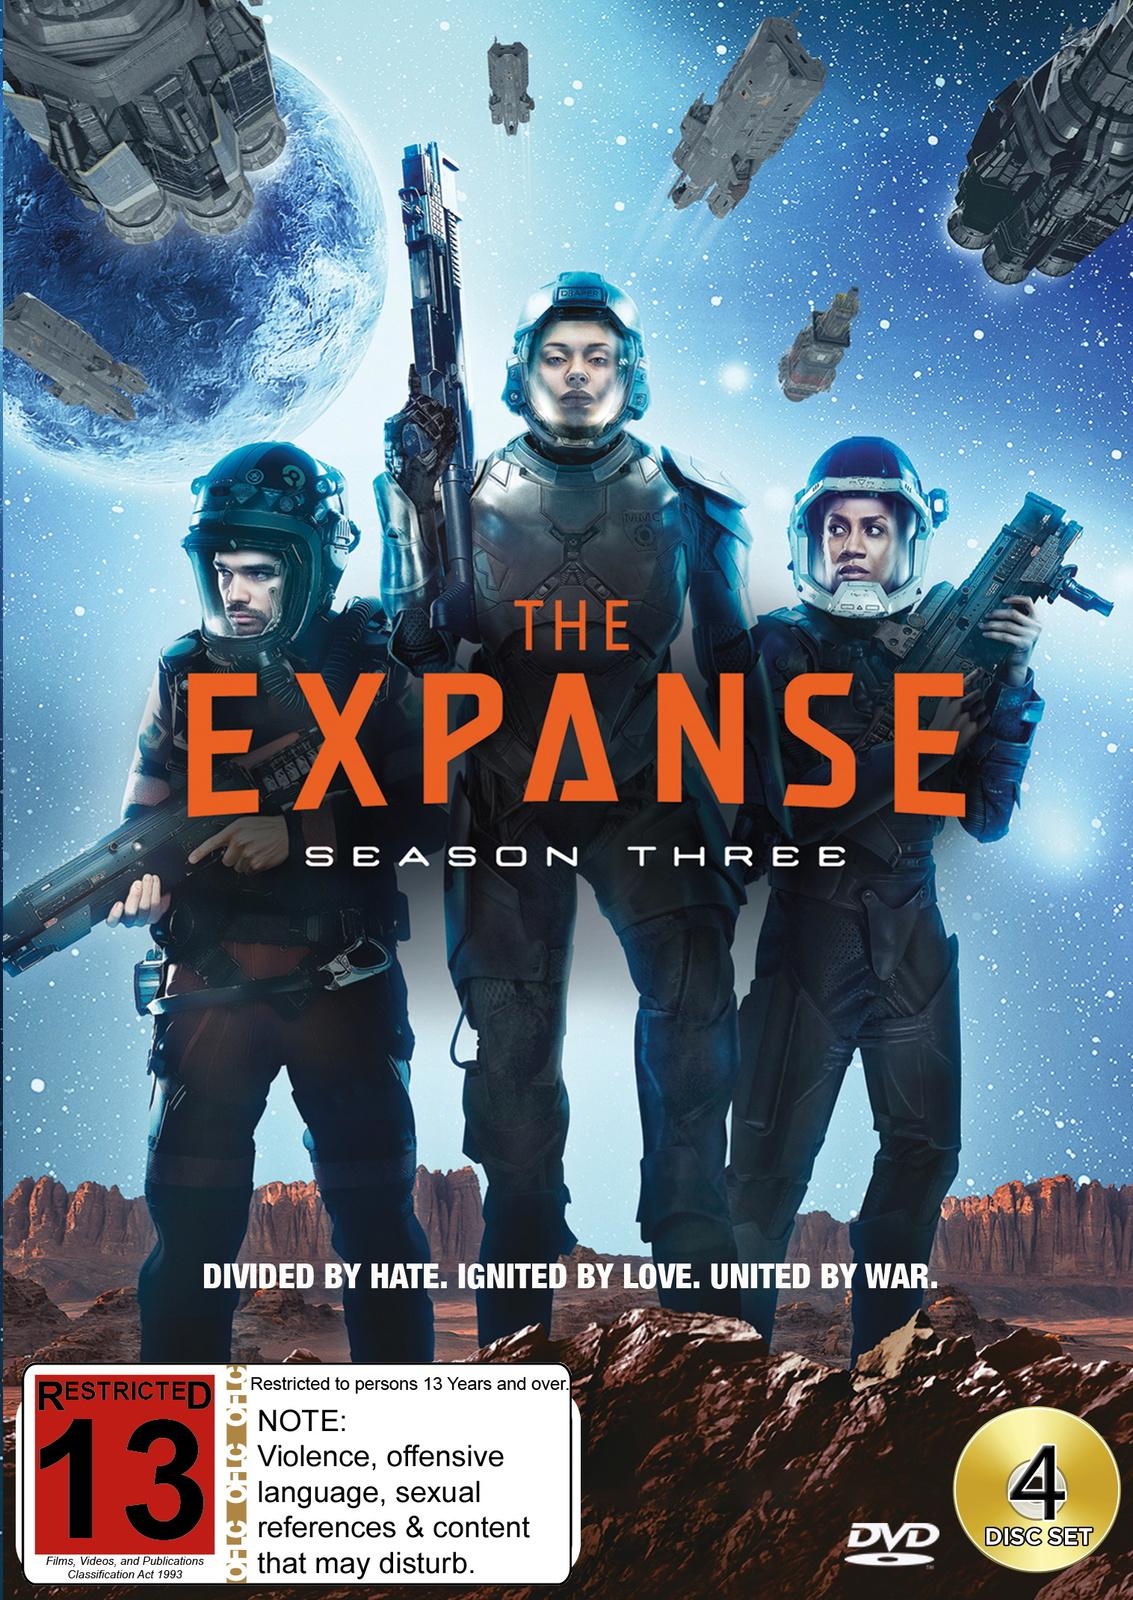 The Expanse - Season 3 on DVD image